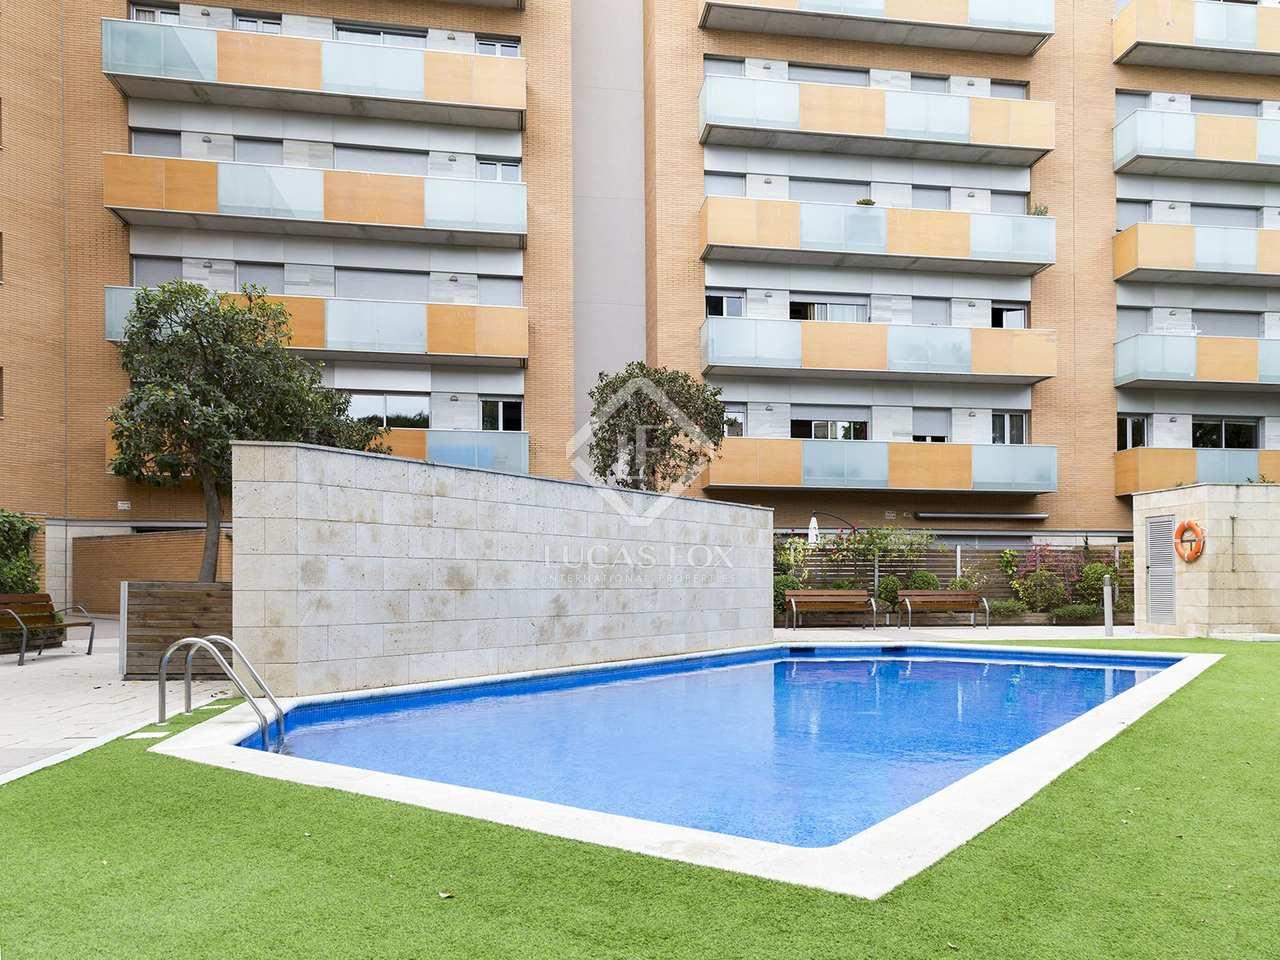 Apartamento con terraza en venta en vila ol mpica barcelona for Piscina olimpica barcelona